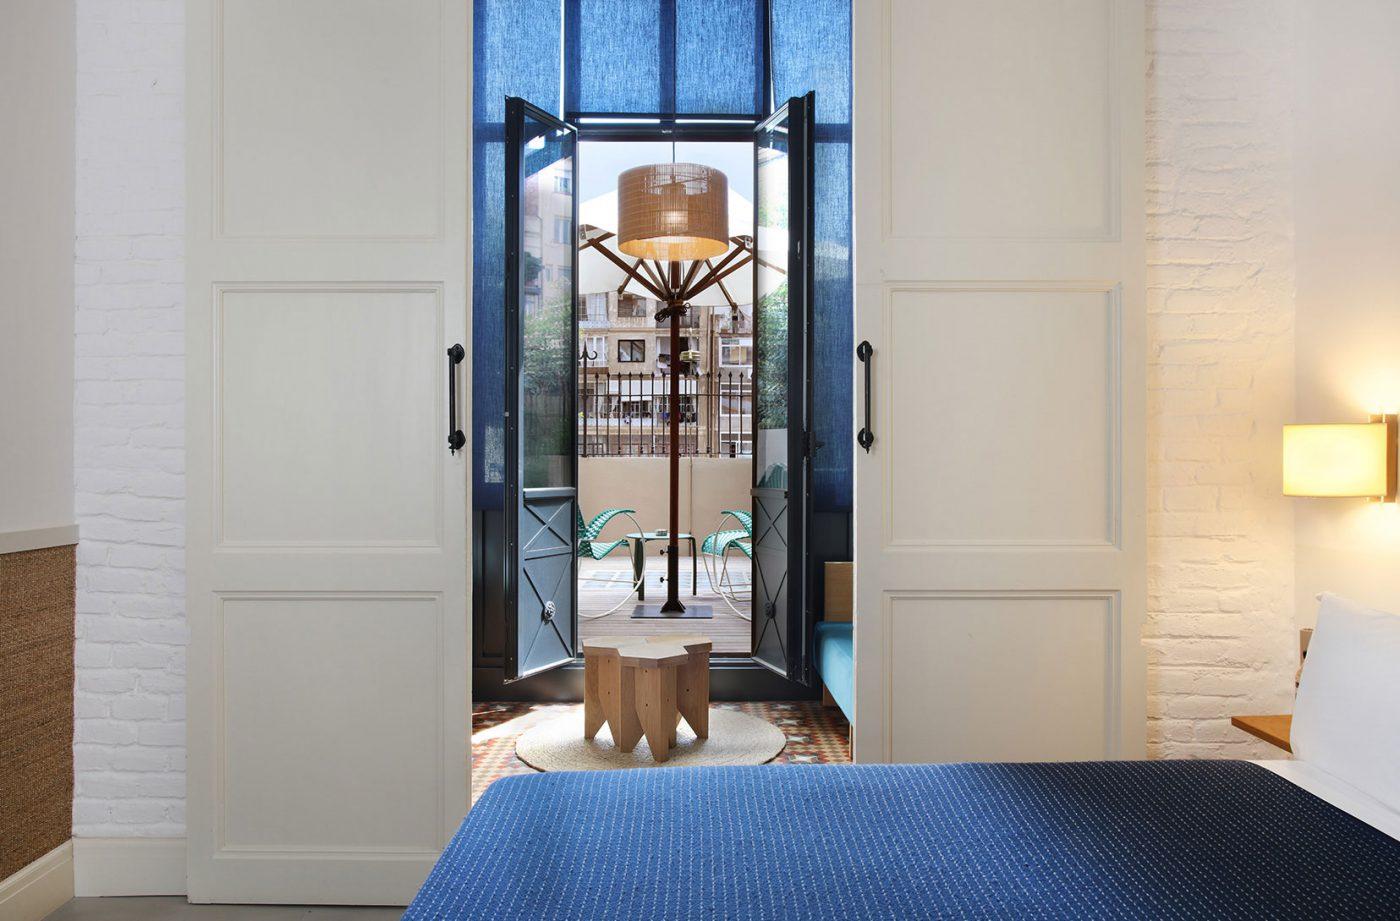 casa-bonay-barcelona-design-hotel-courtyard-large-terrace-02-1400x921.jpg